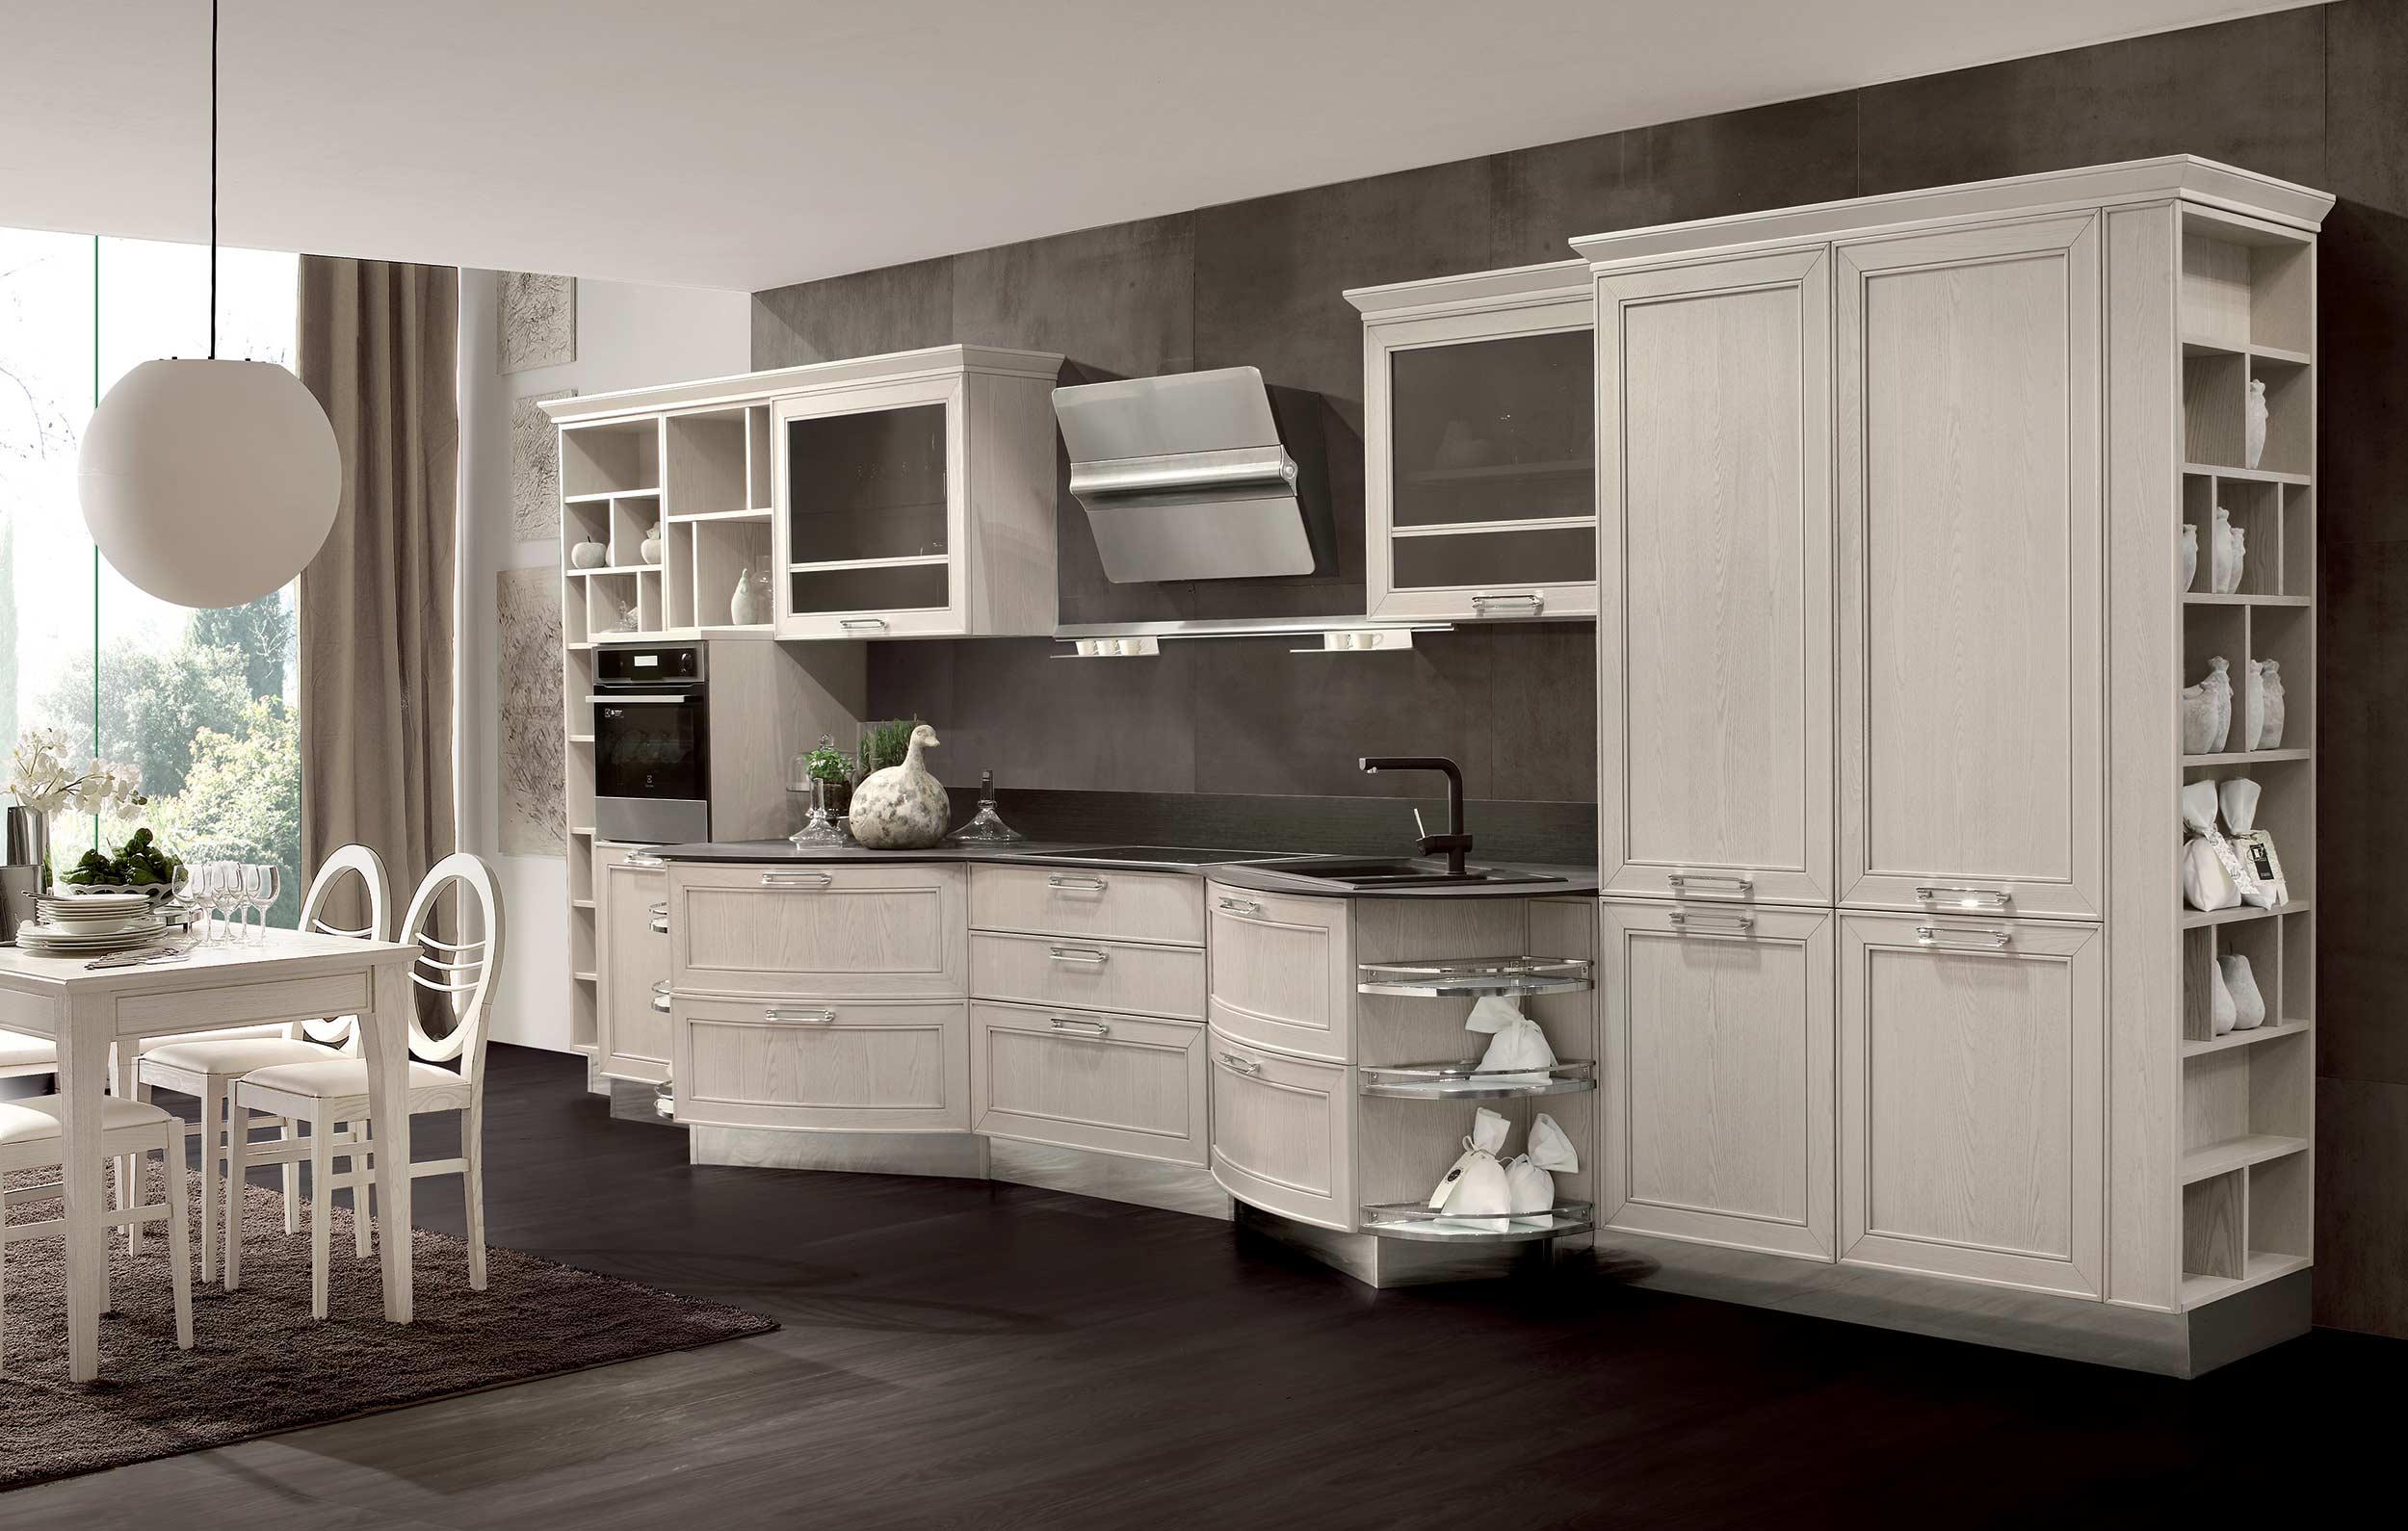 Best Cucina Stosa Beverly Prezzo Photos - Home Interior Ideas ...